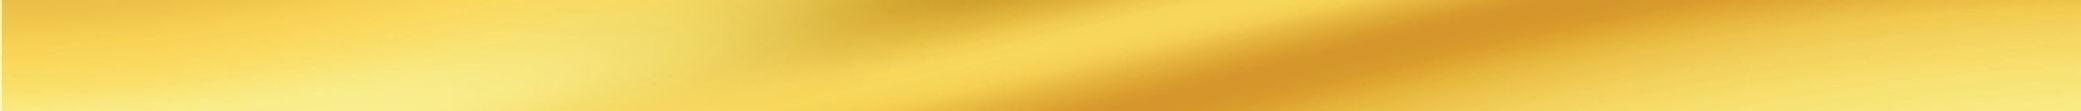 Gold Silk Blanket iStock-452257579 (5)_e